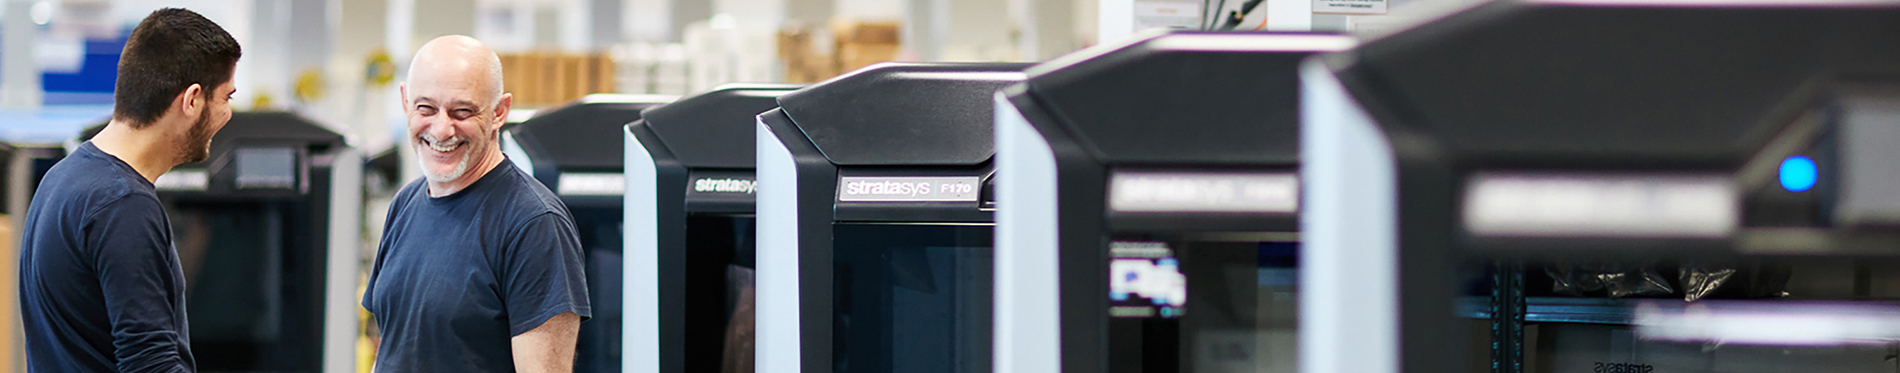 Stratasys Plastic 3D Printers - Creatz3D banner